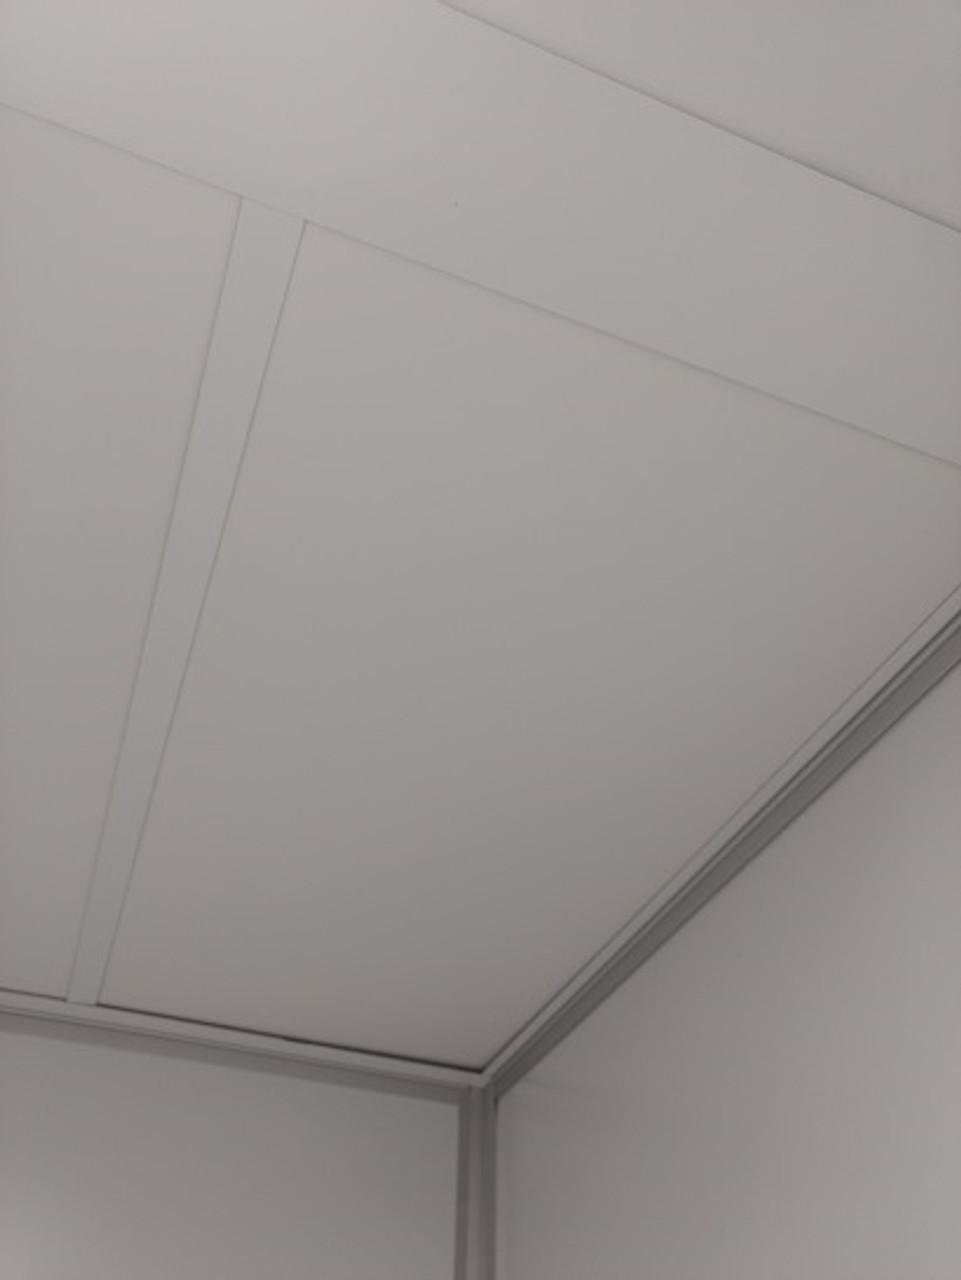 cleanroom ceiling tiles vinyl covered gypsum tiles 24 x 48 4 pack price per pack ww 3270 24